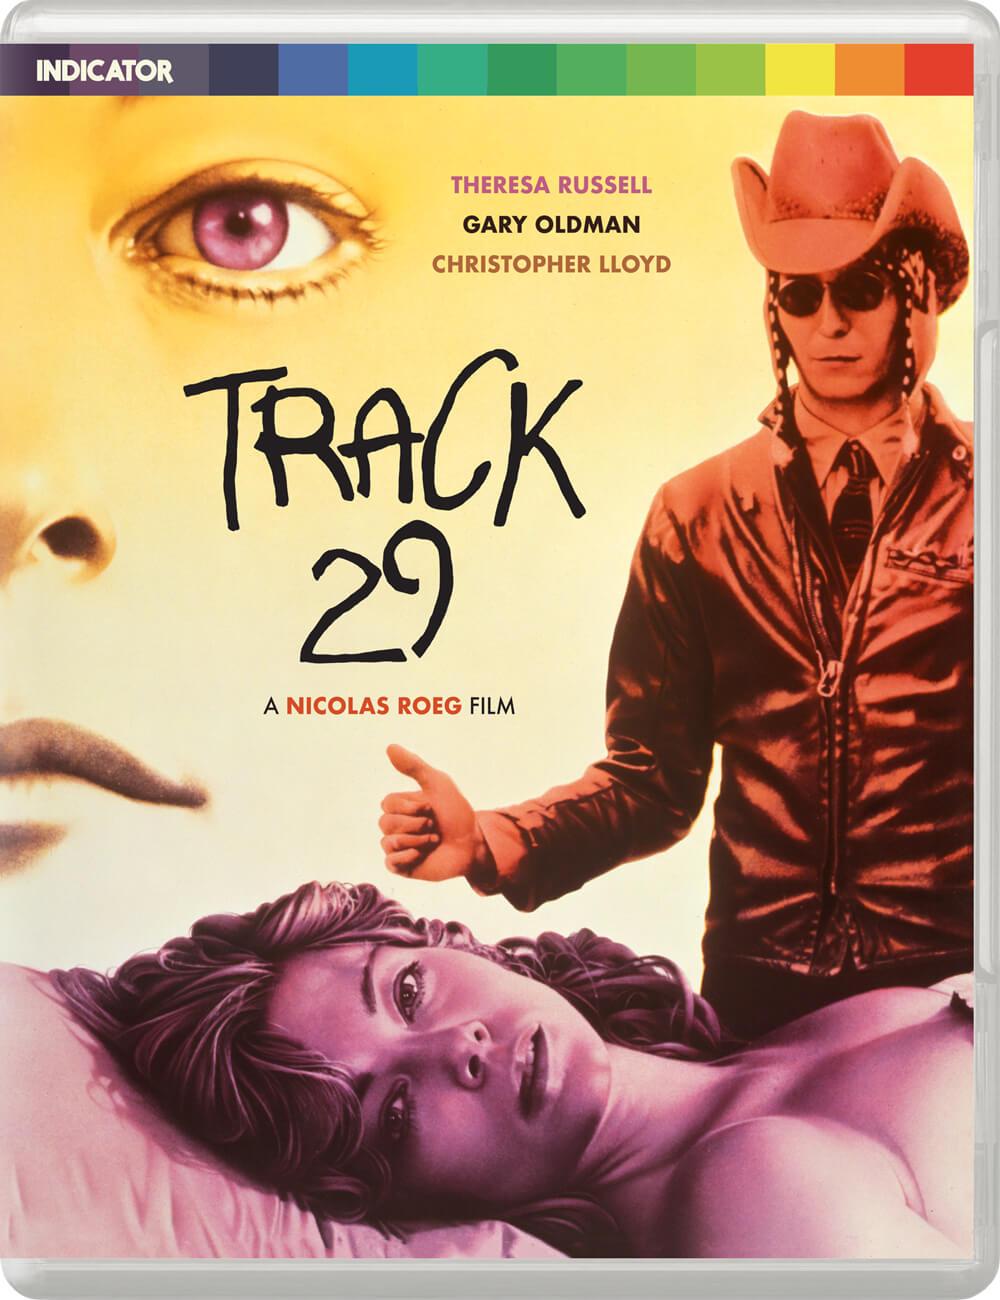 Buy Track 29 (Blu-ray)